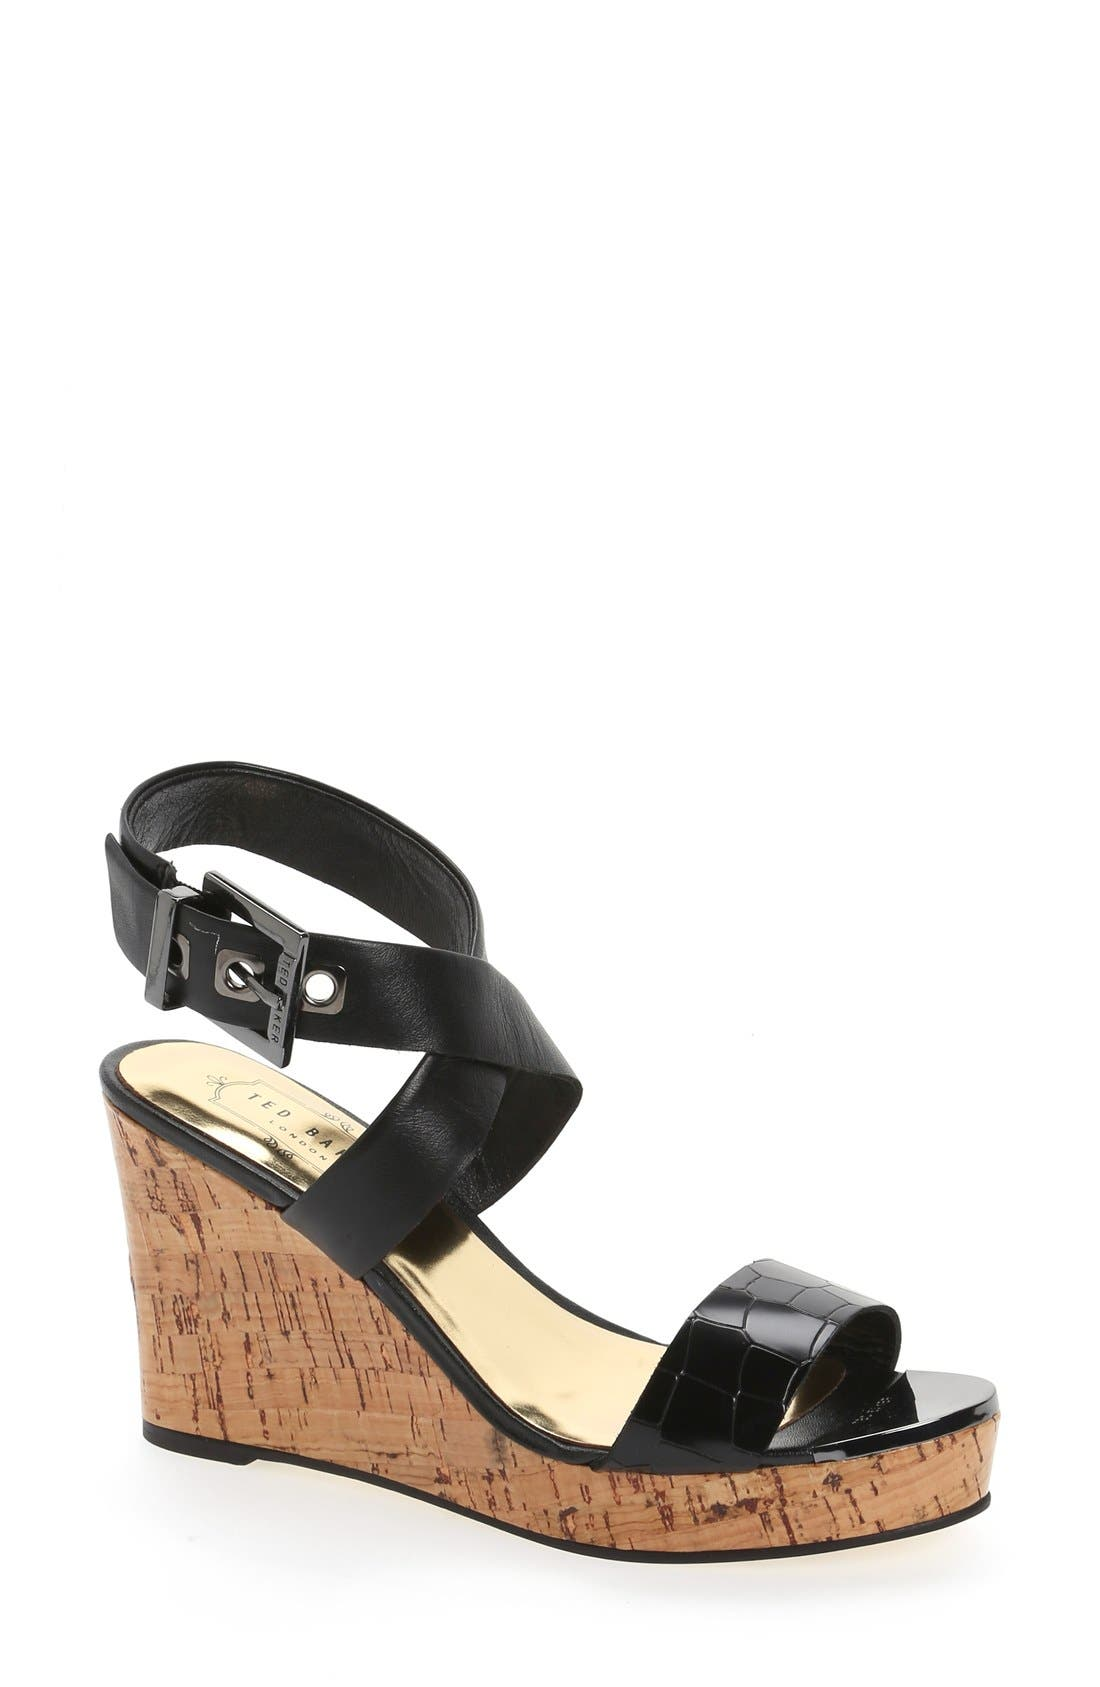 Main Image - Ted Baker London 'Oliviaa' Wedge Sandal